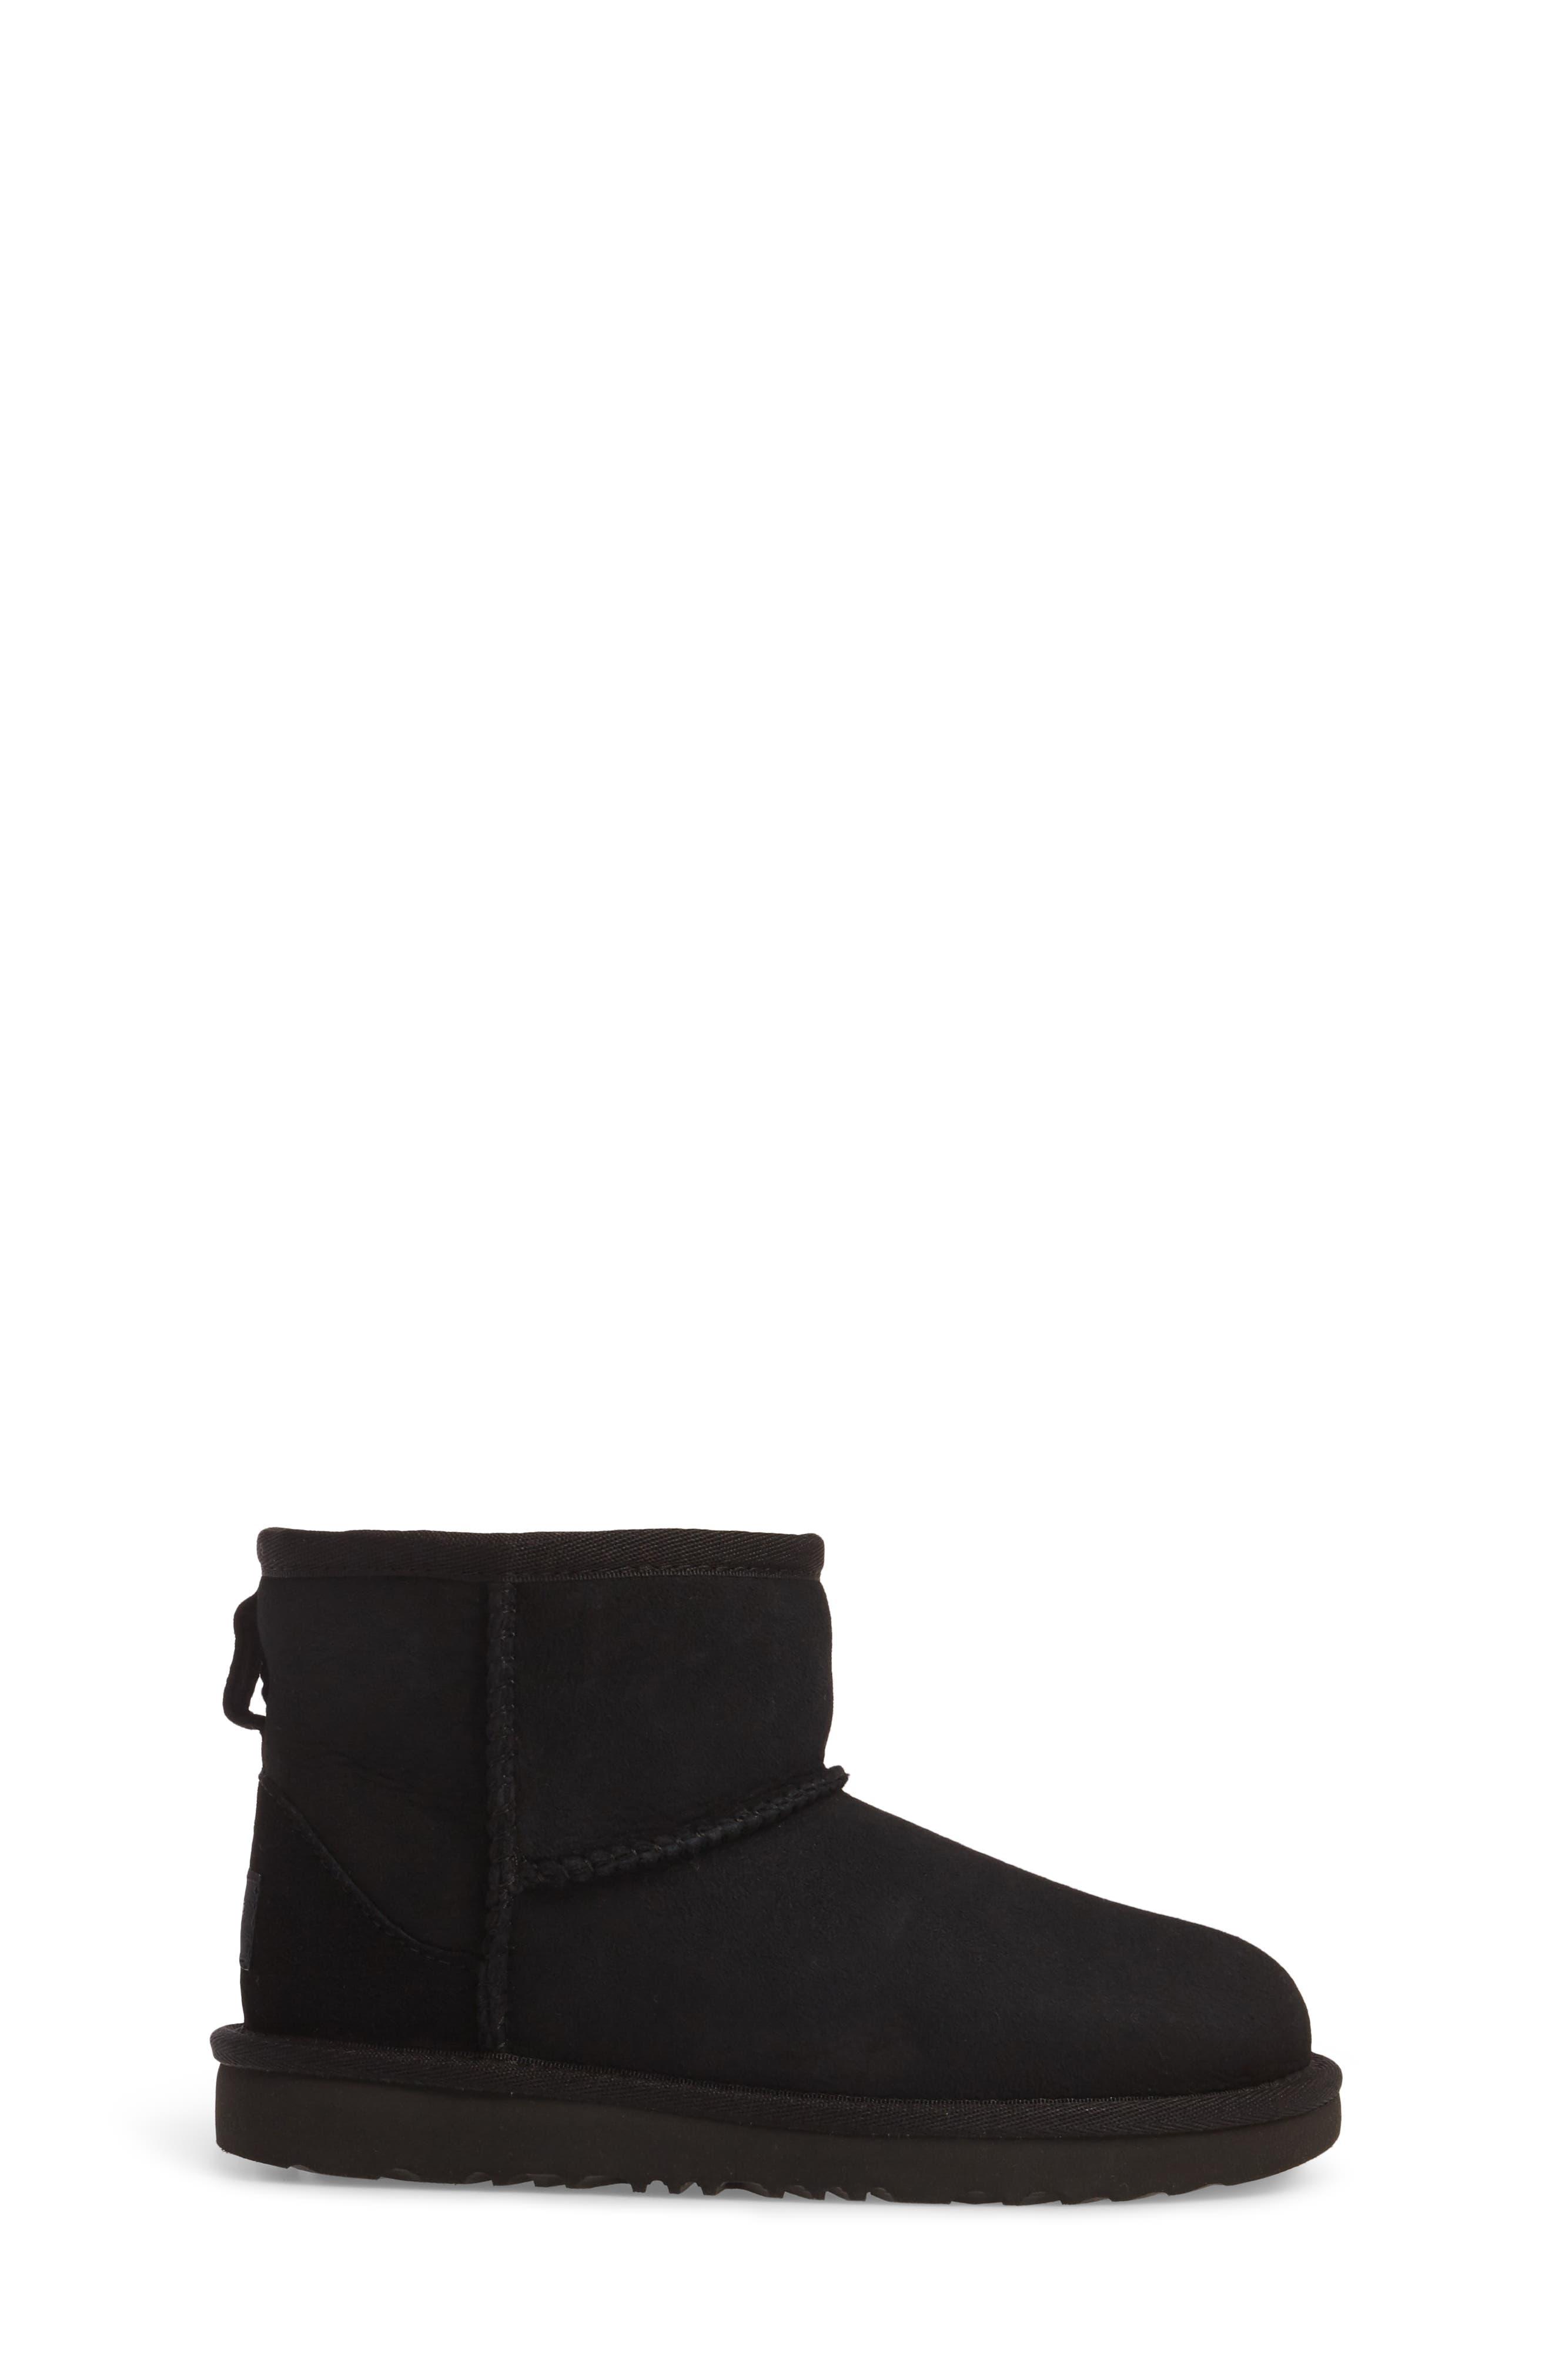 UGG<SUP>®</SUP>, Classic Mini II Water-Resistant Genuine Shearling Boot, Alternate thumbnail 3, color, BLACK